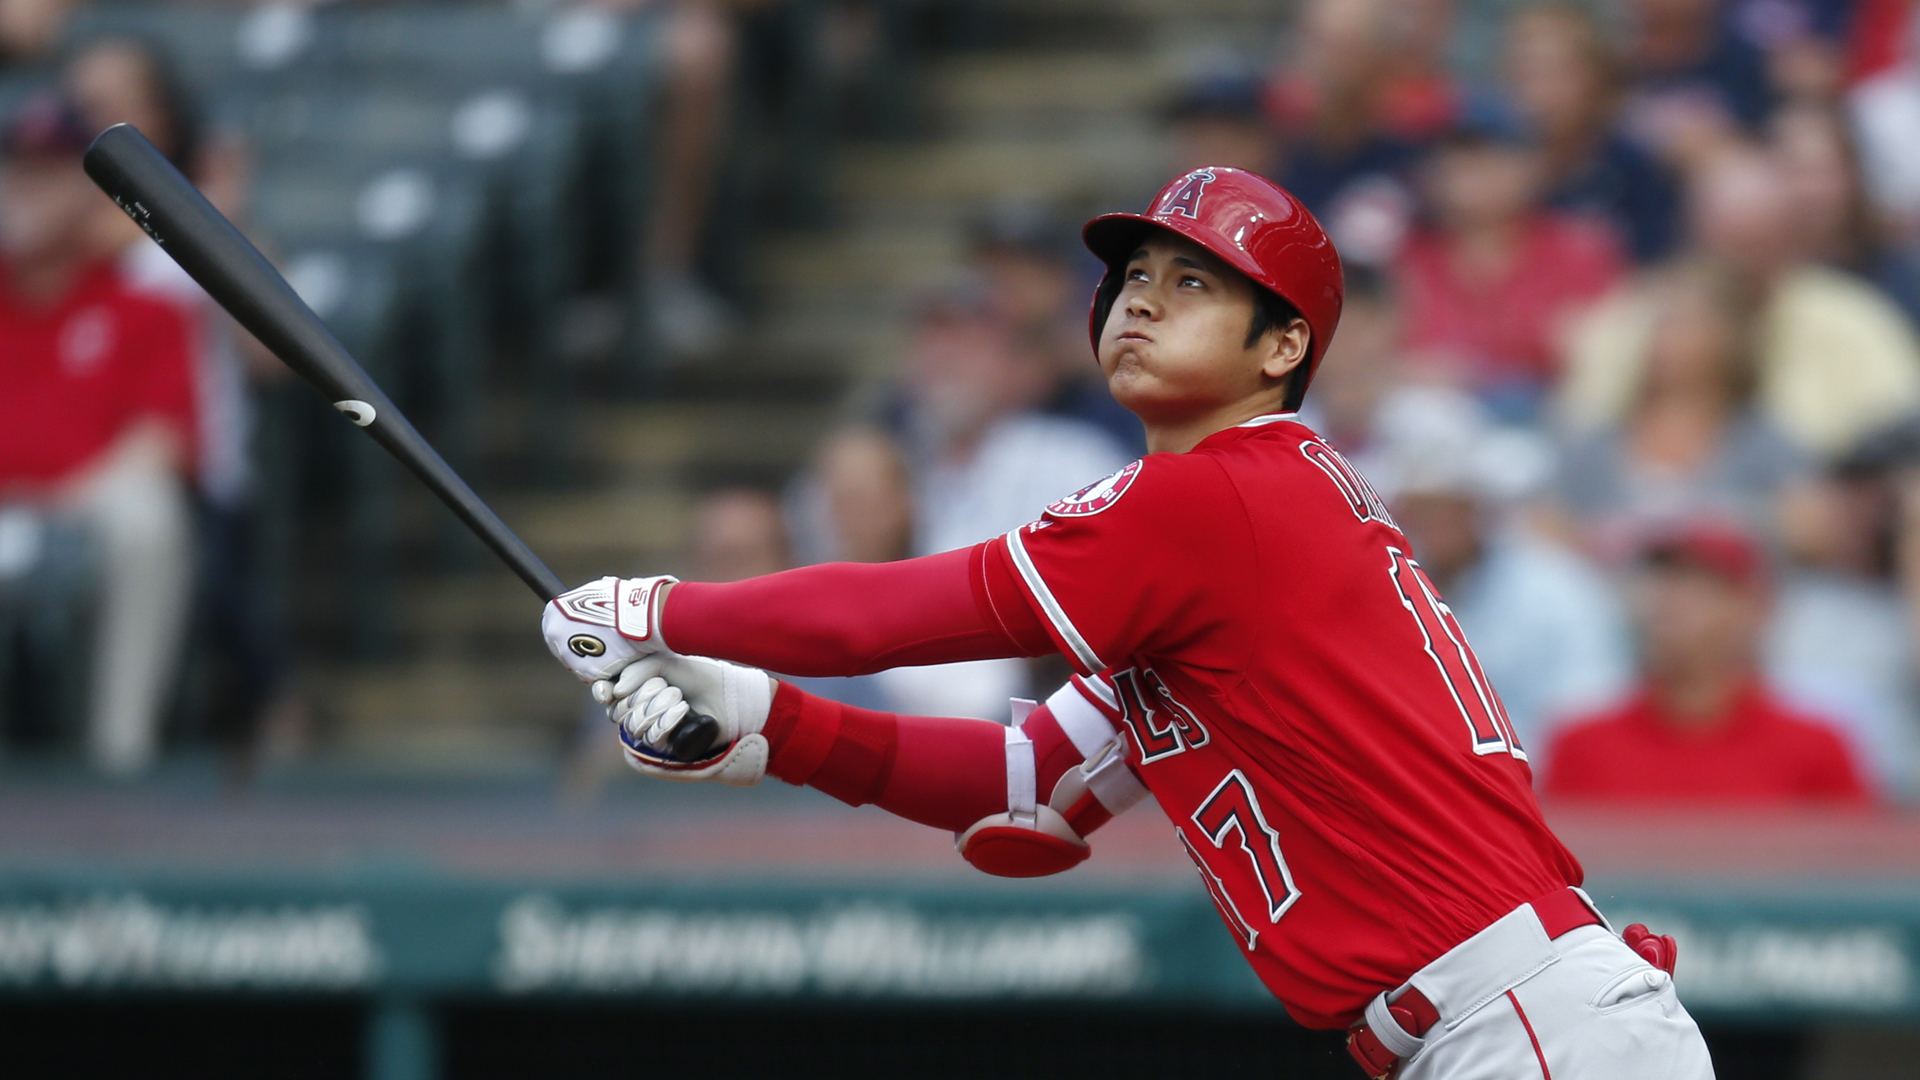 newest 90bba b8b54 Shohei Ohtani on first MLB season: 'It was a good year ...